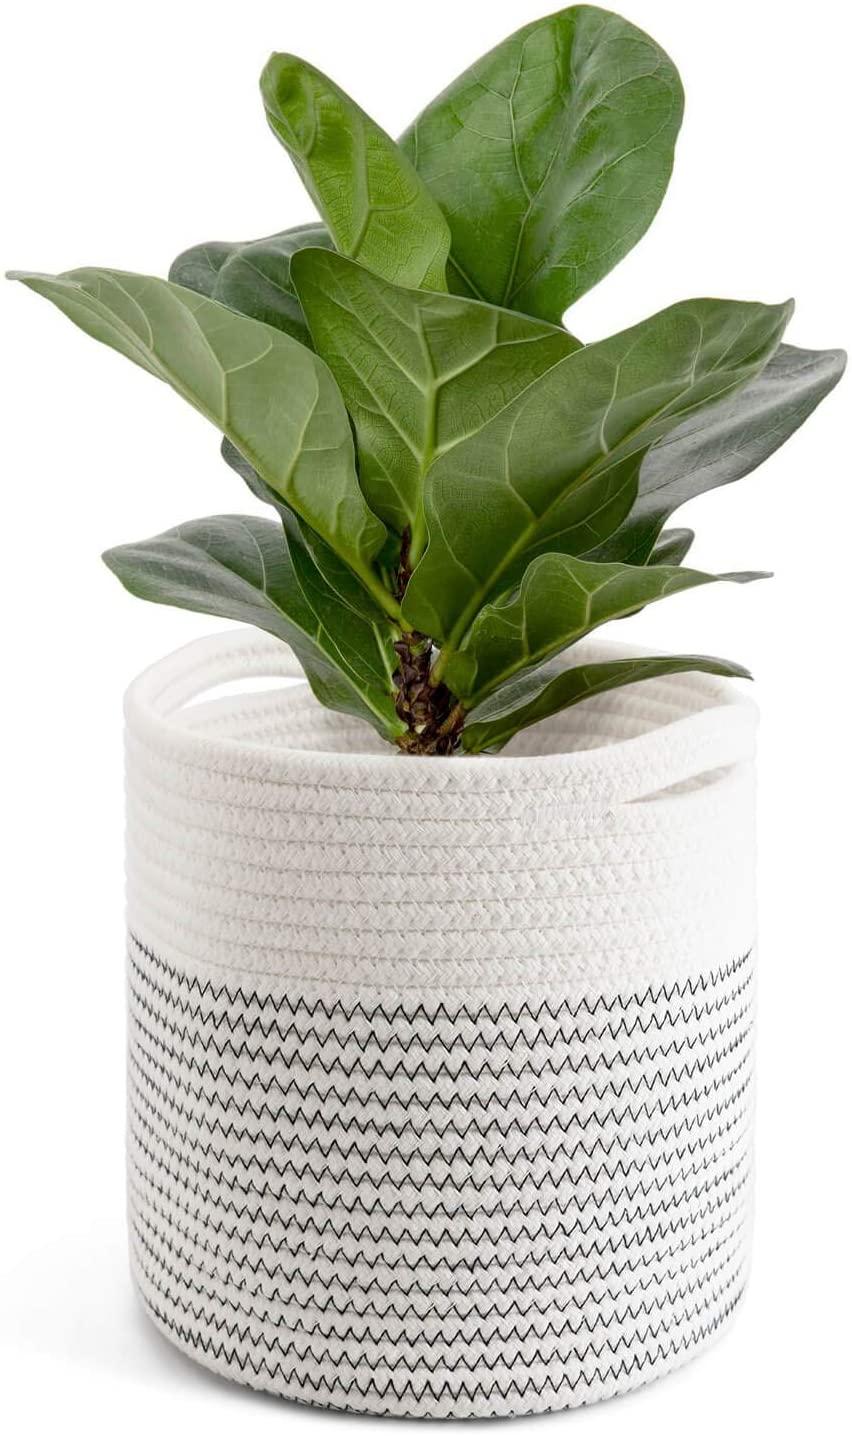 "TIMEYARD Cotton Rope Plant Basket Modern Woven Basket up to 7.5 Inch Flower Pot Floor Indoor Planters, 8"" x 8"" Storage Organizer Basket Rustic Home Décor"